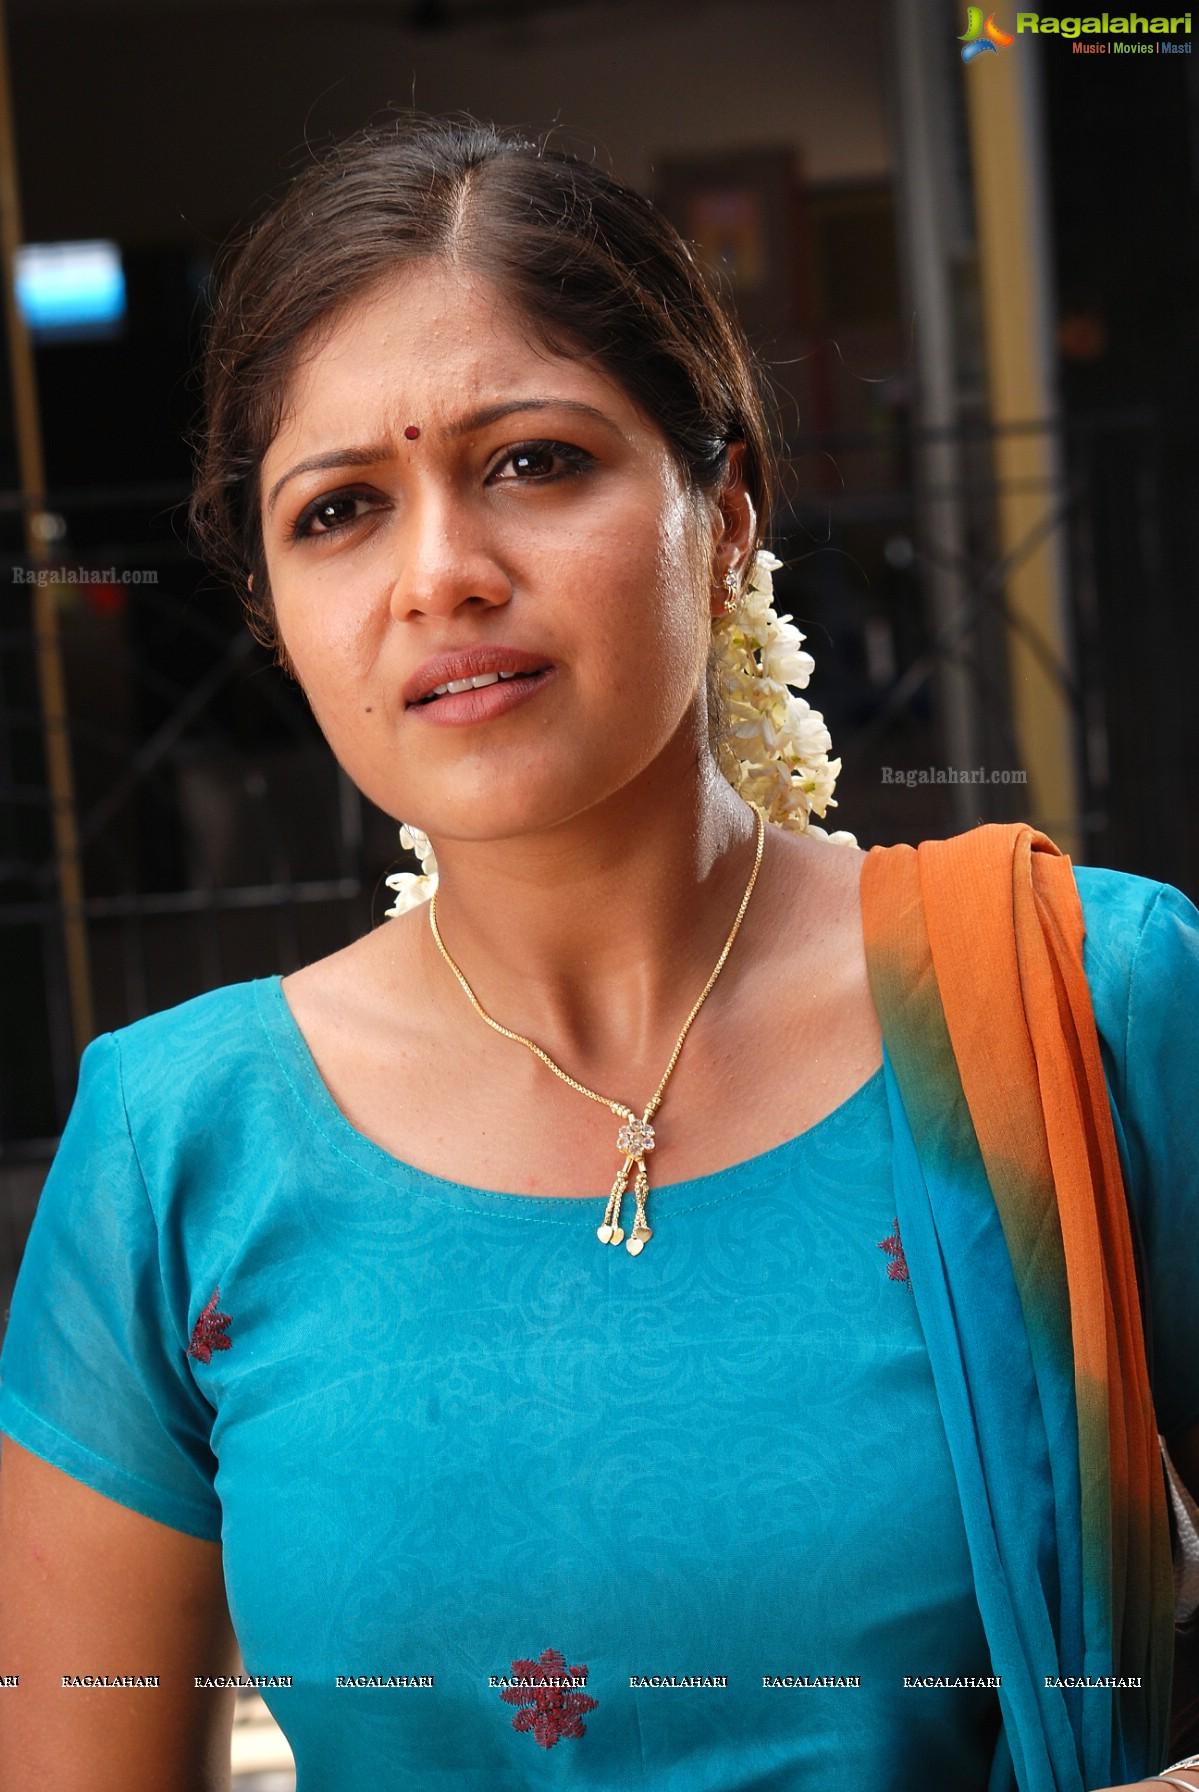 Meghana Raj Meghana Raj new picture